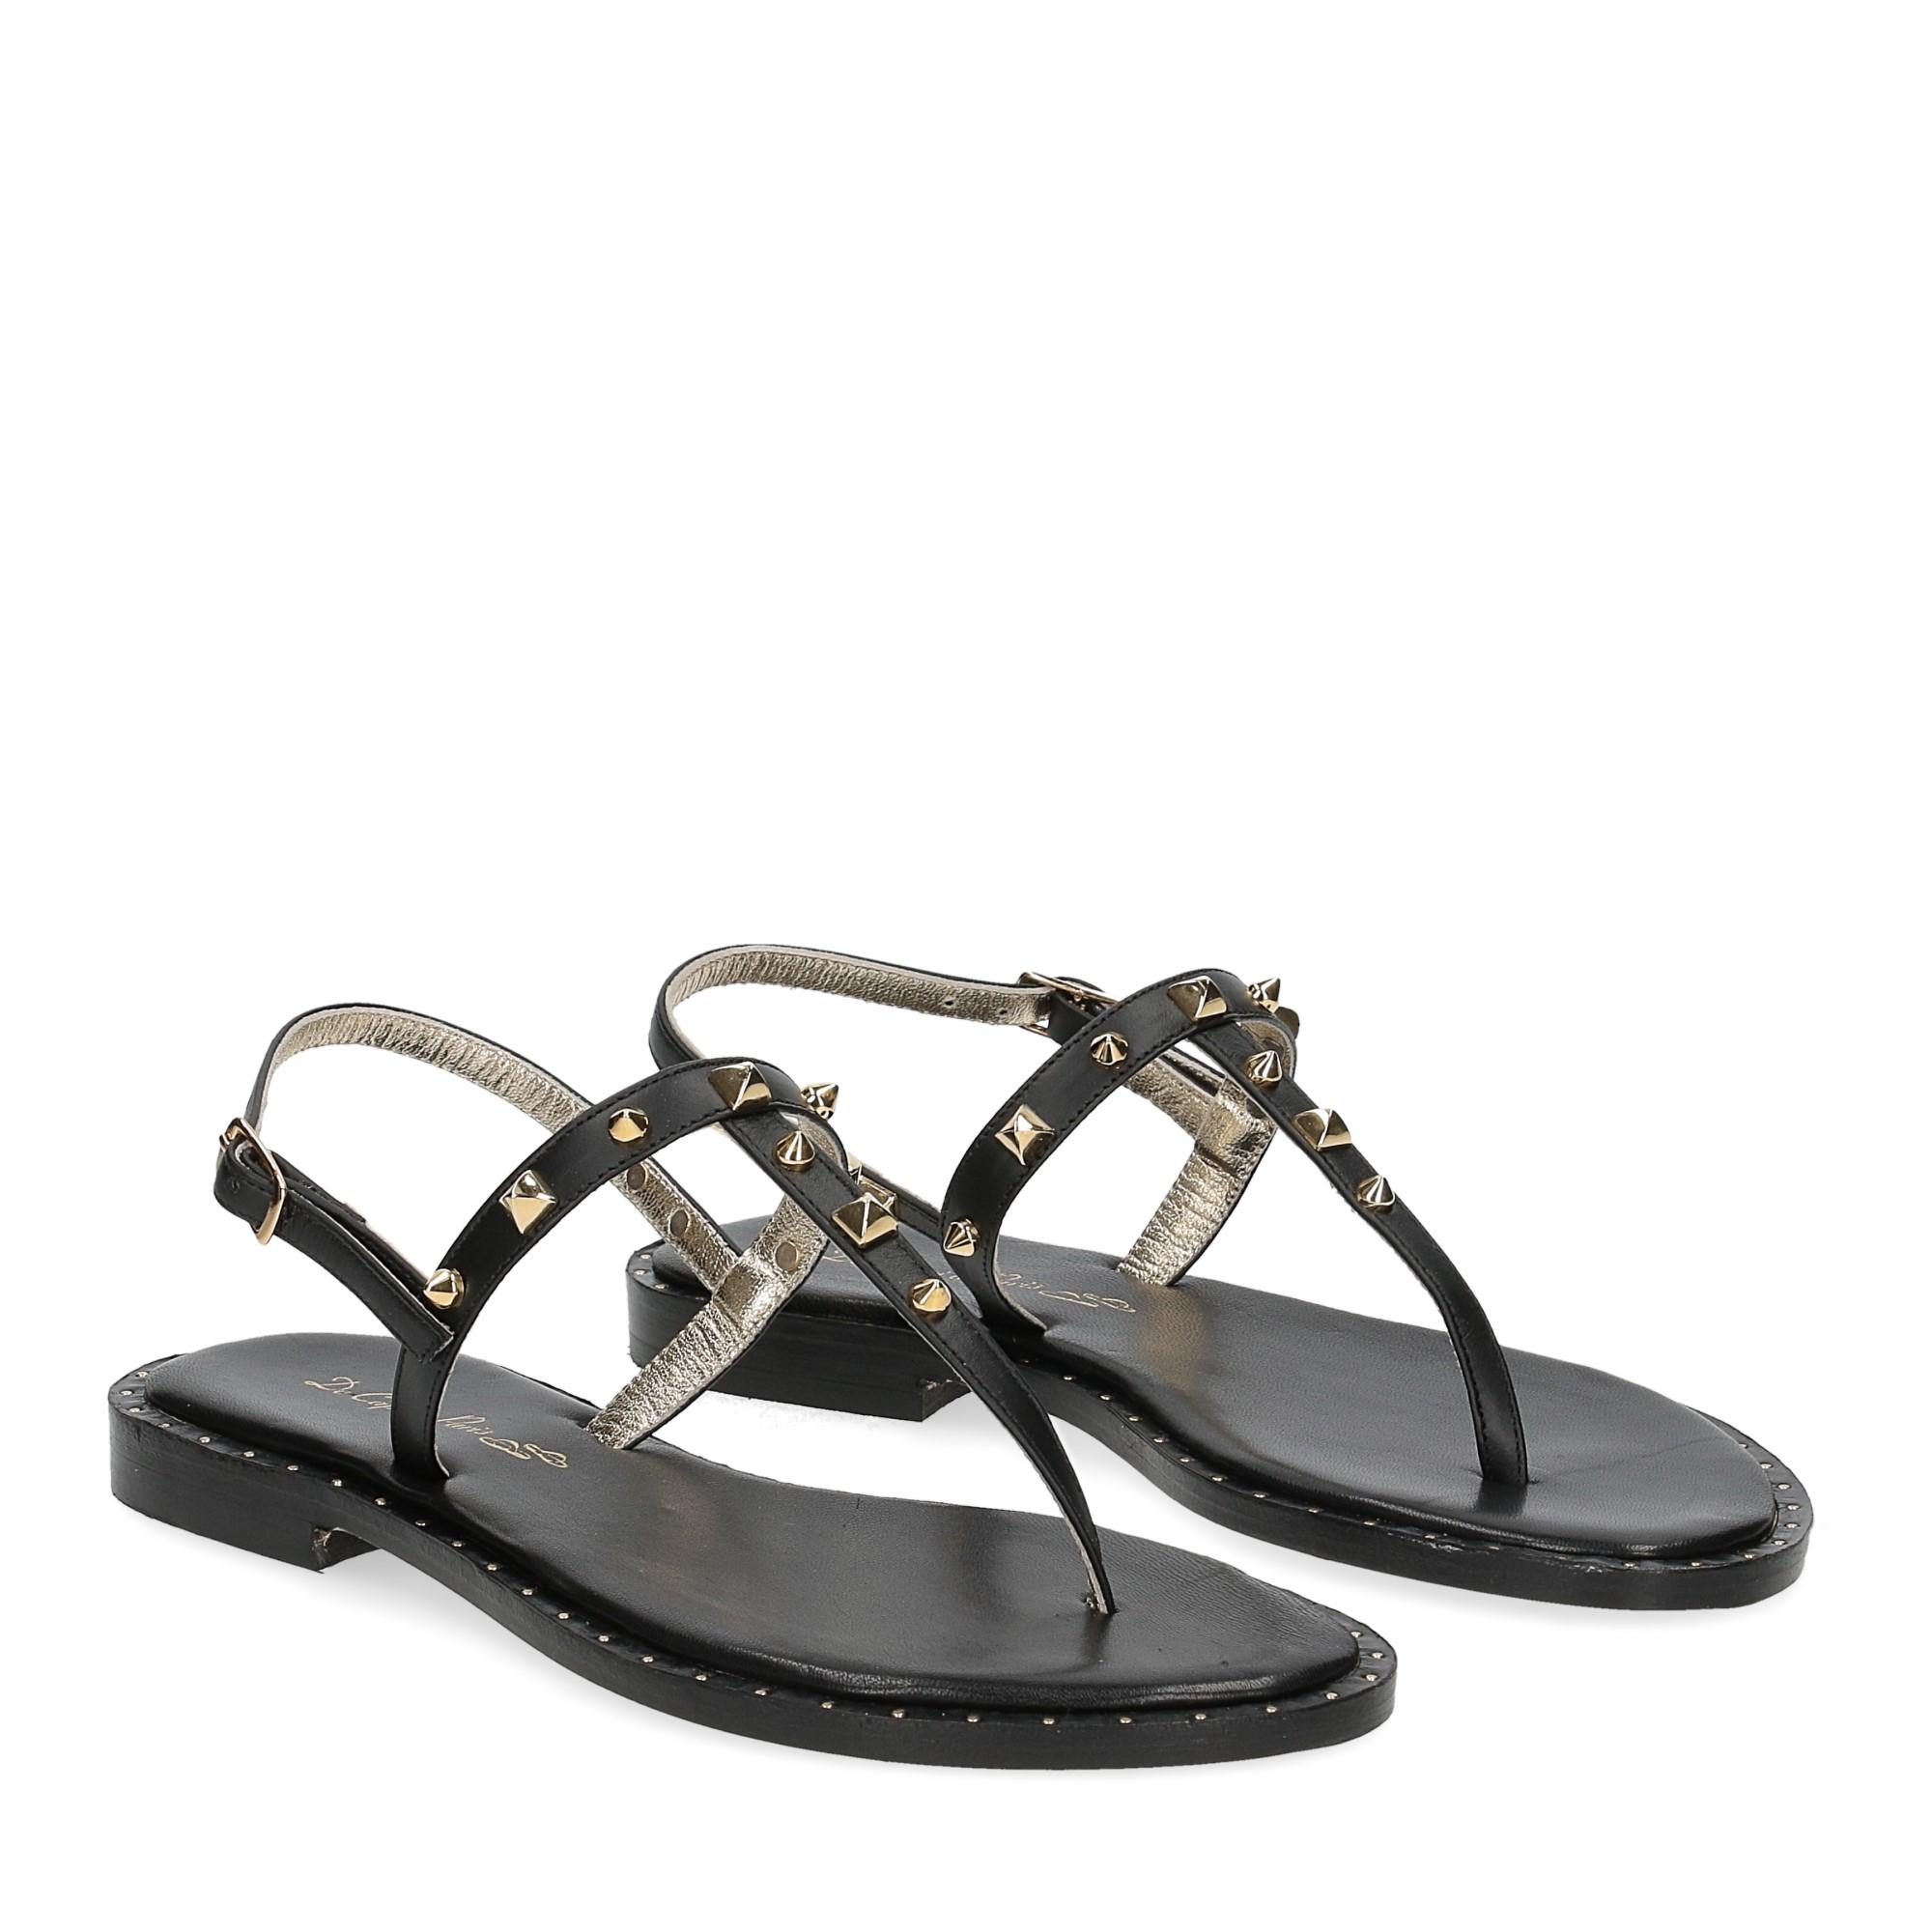 De Capri a Paris sandalo infradito borchie pelle nera